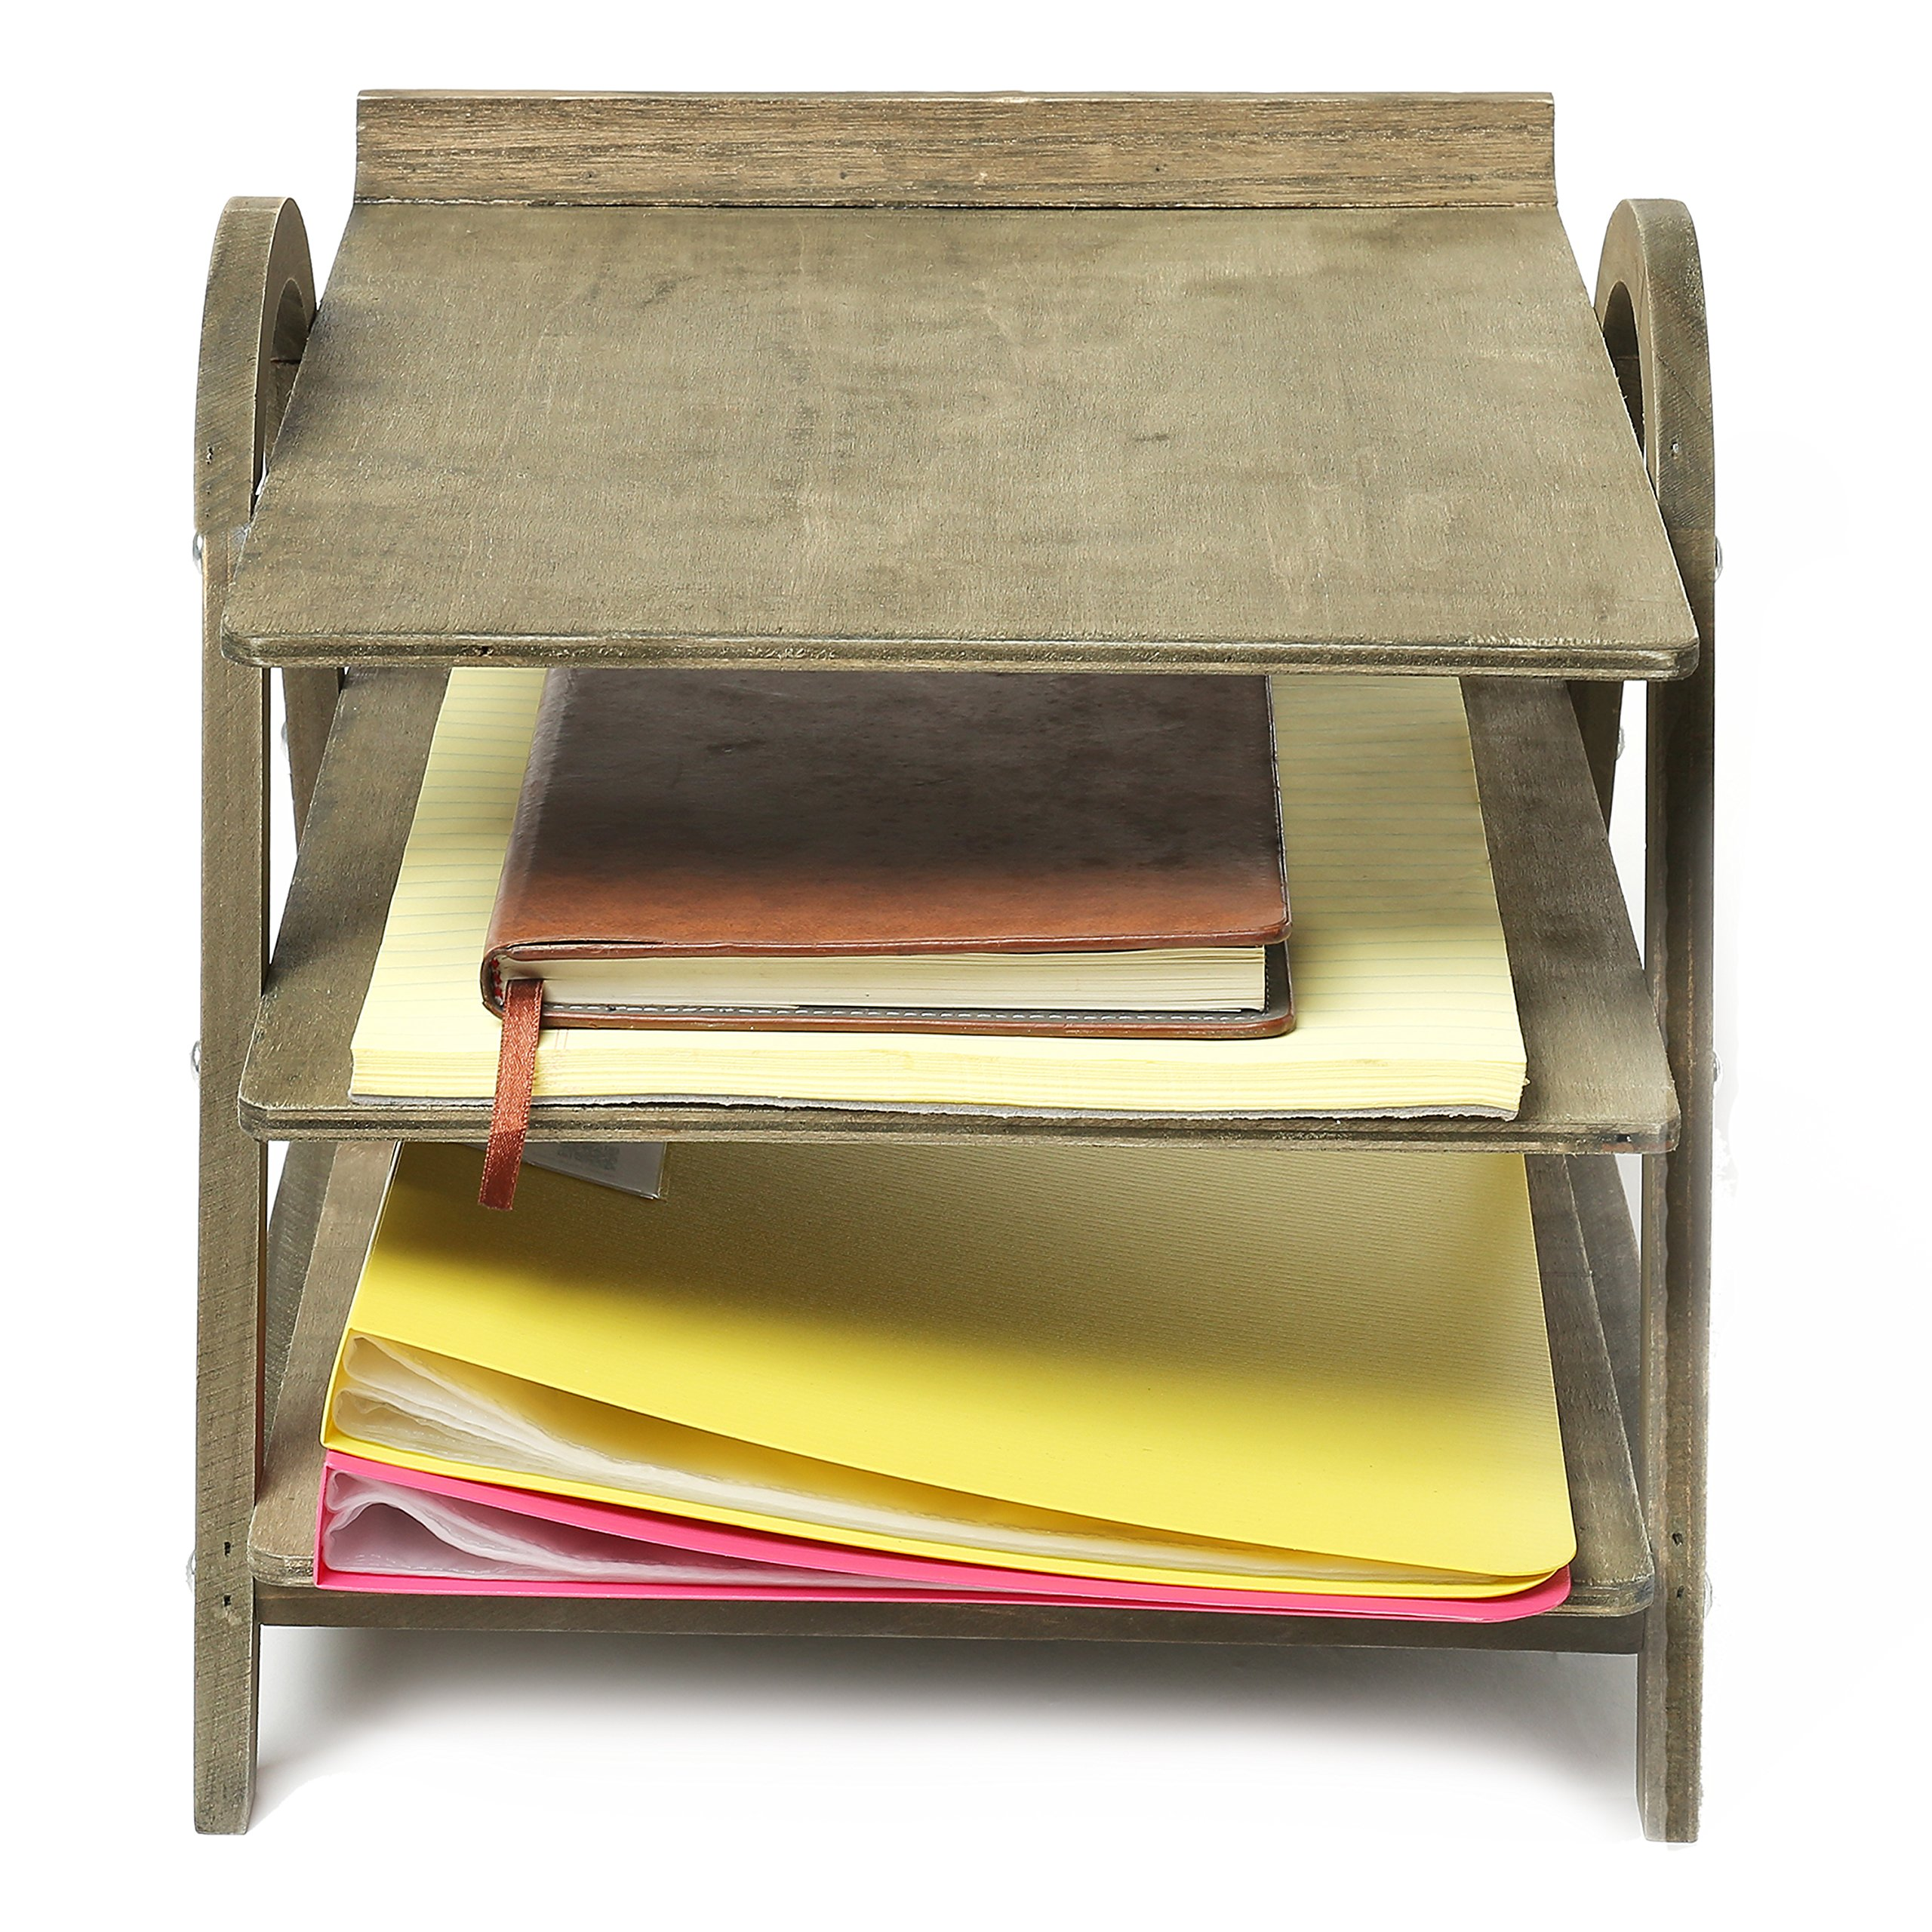 3 Tier Vintage Gray Wood Desktop Office Document Tray Holder, File Folder Rack by MyGift (Image #5)